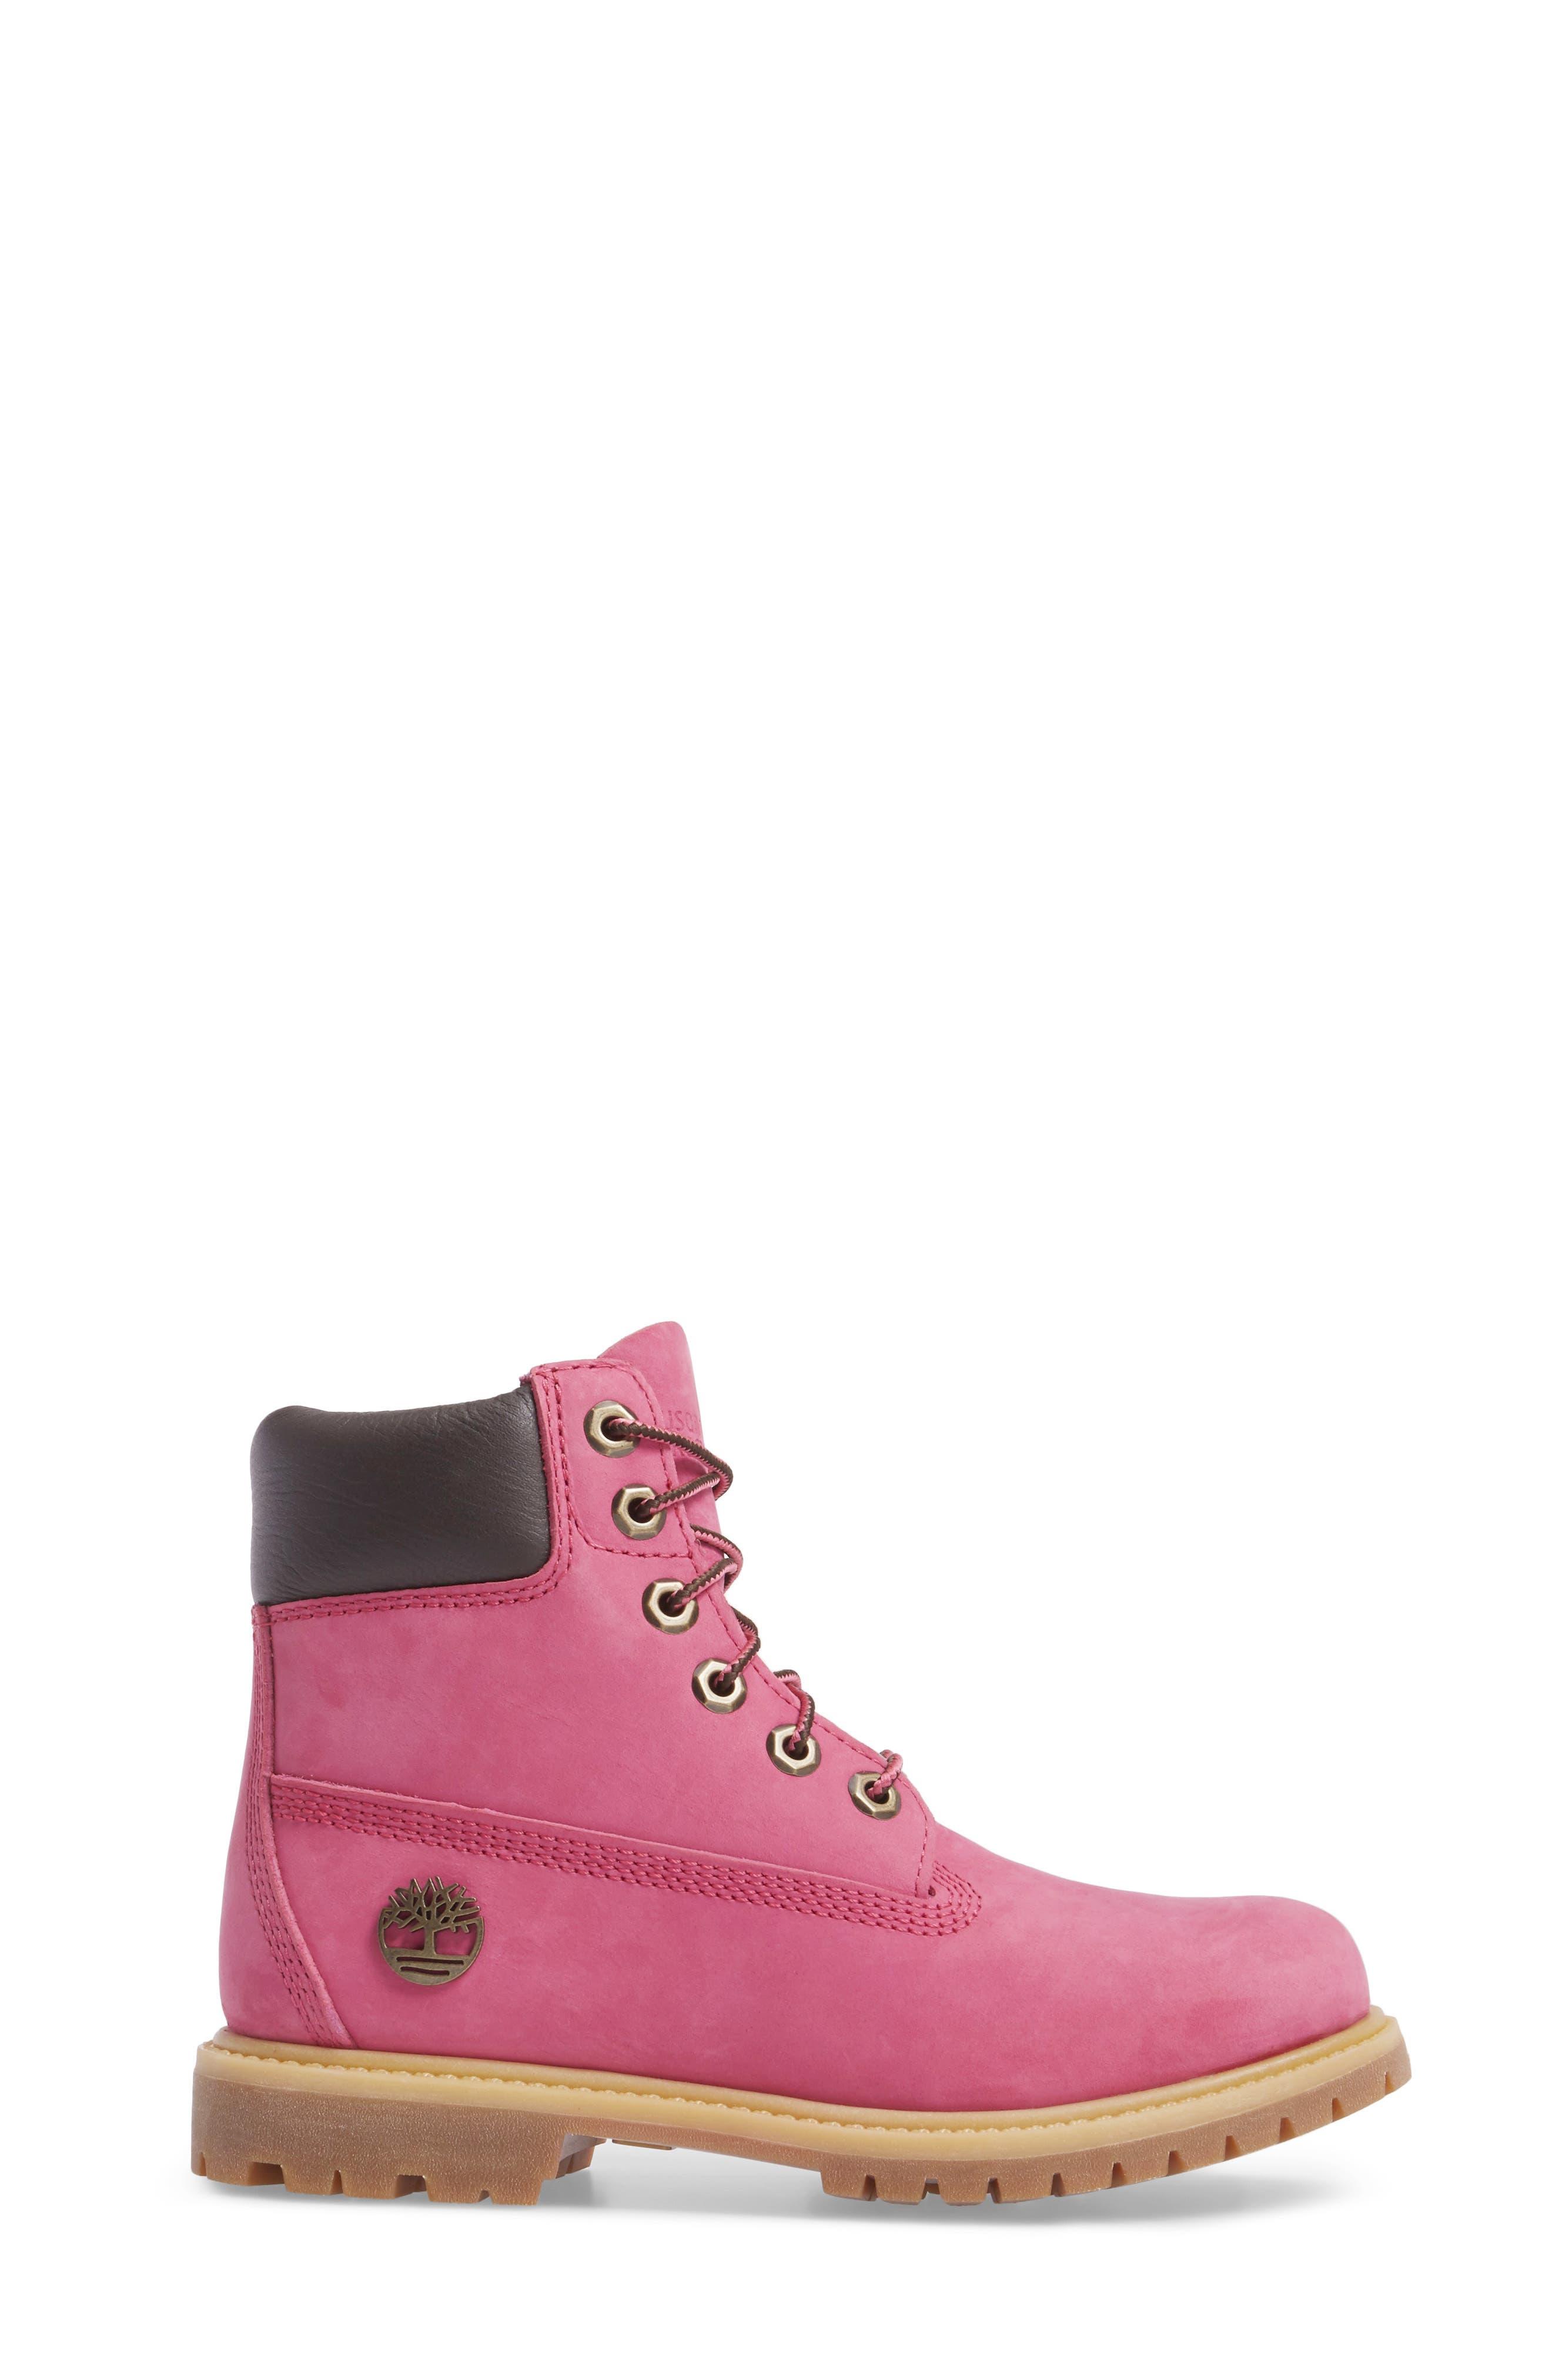 x Susan G. Komen 6-Inch Waterproof Insulated Boot,                             Alternate thumbnail 3, color,                             Bright Pink Nubuck